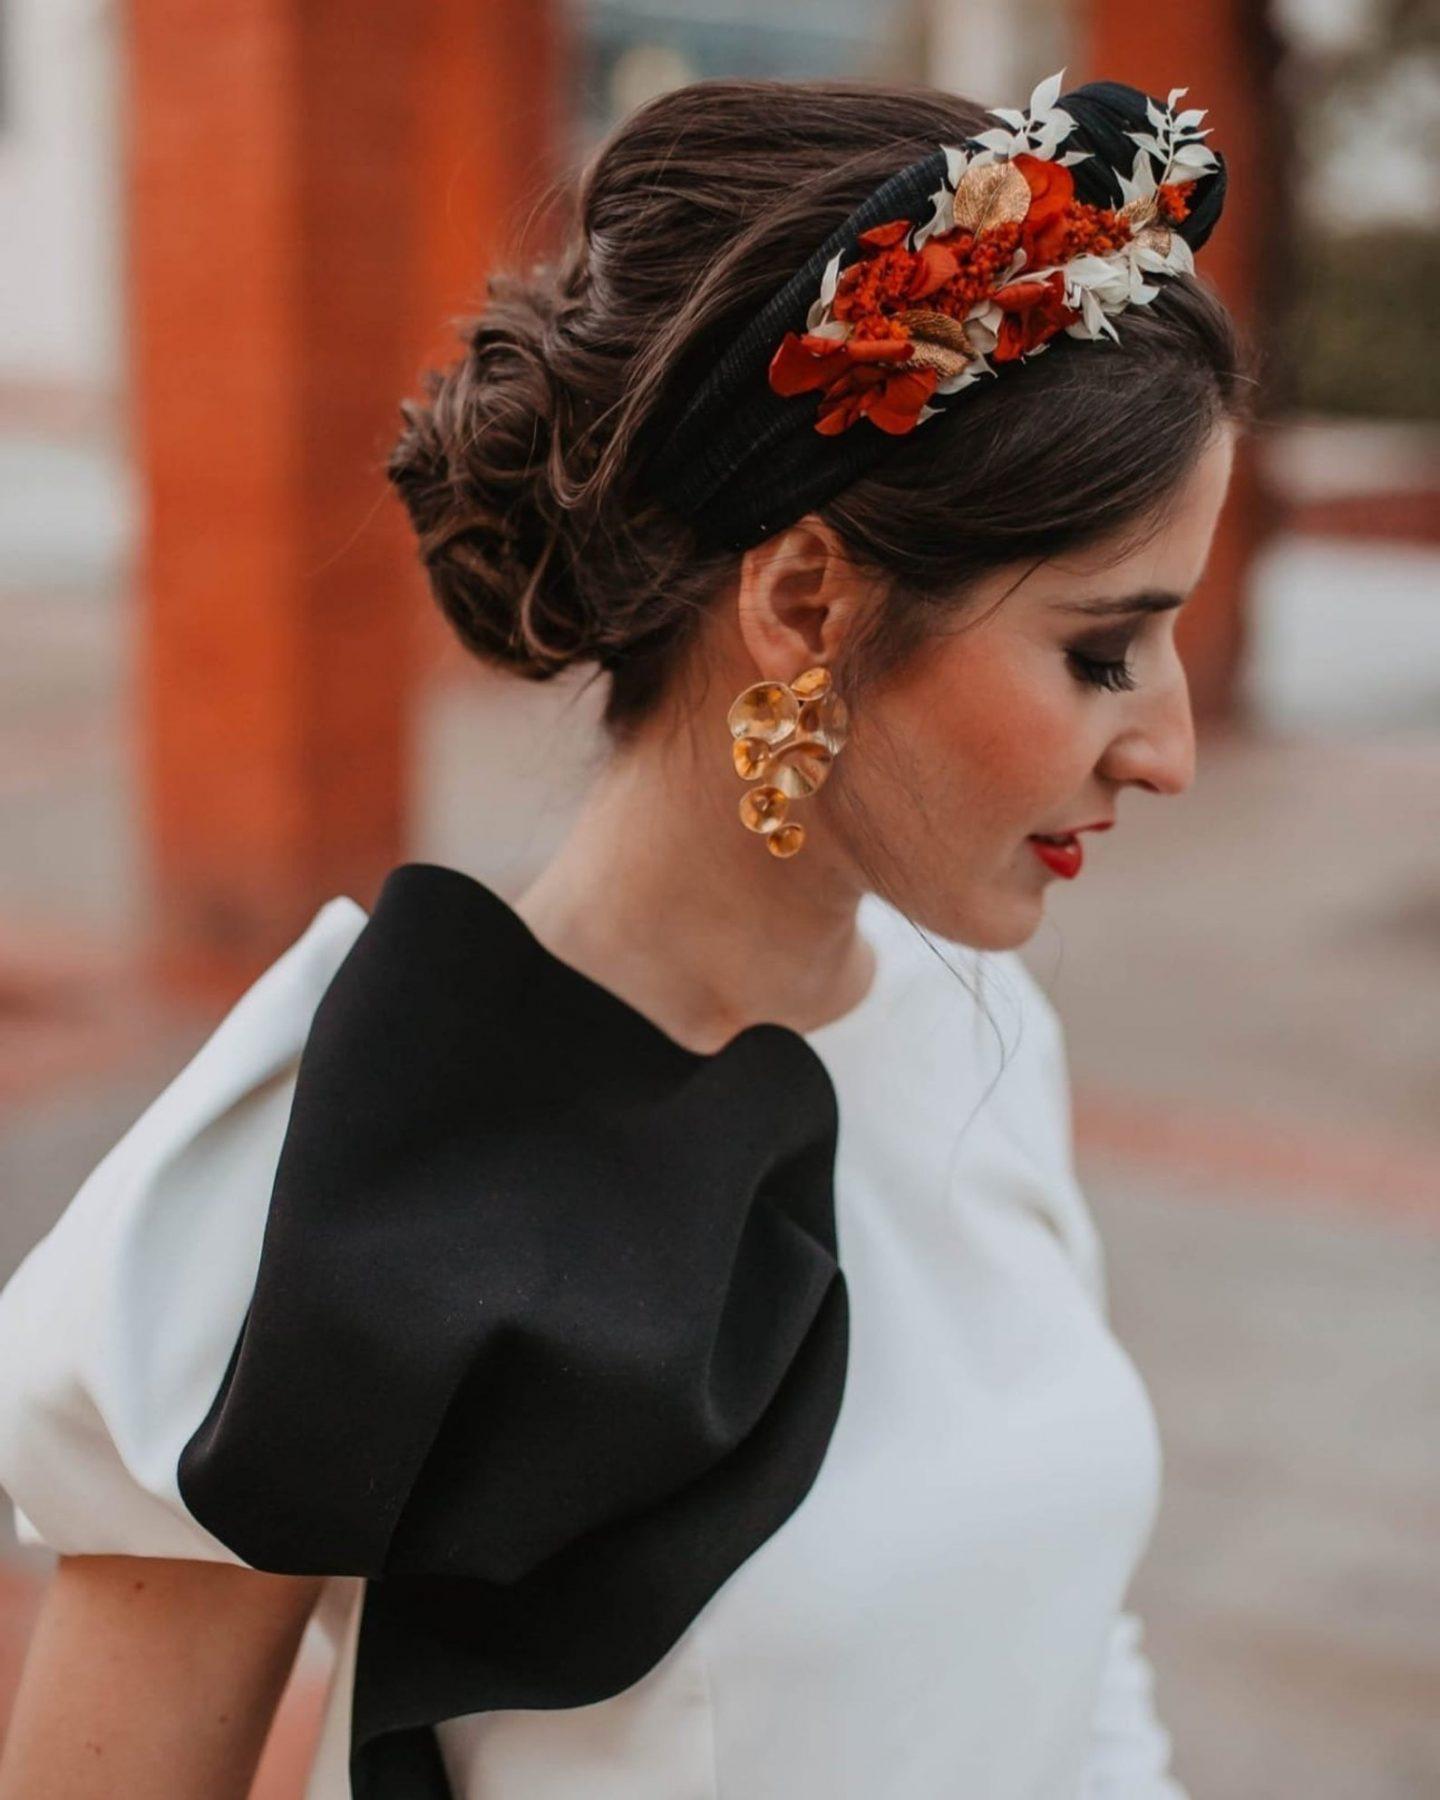 Black Turban Headband with Natural Florals